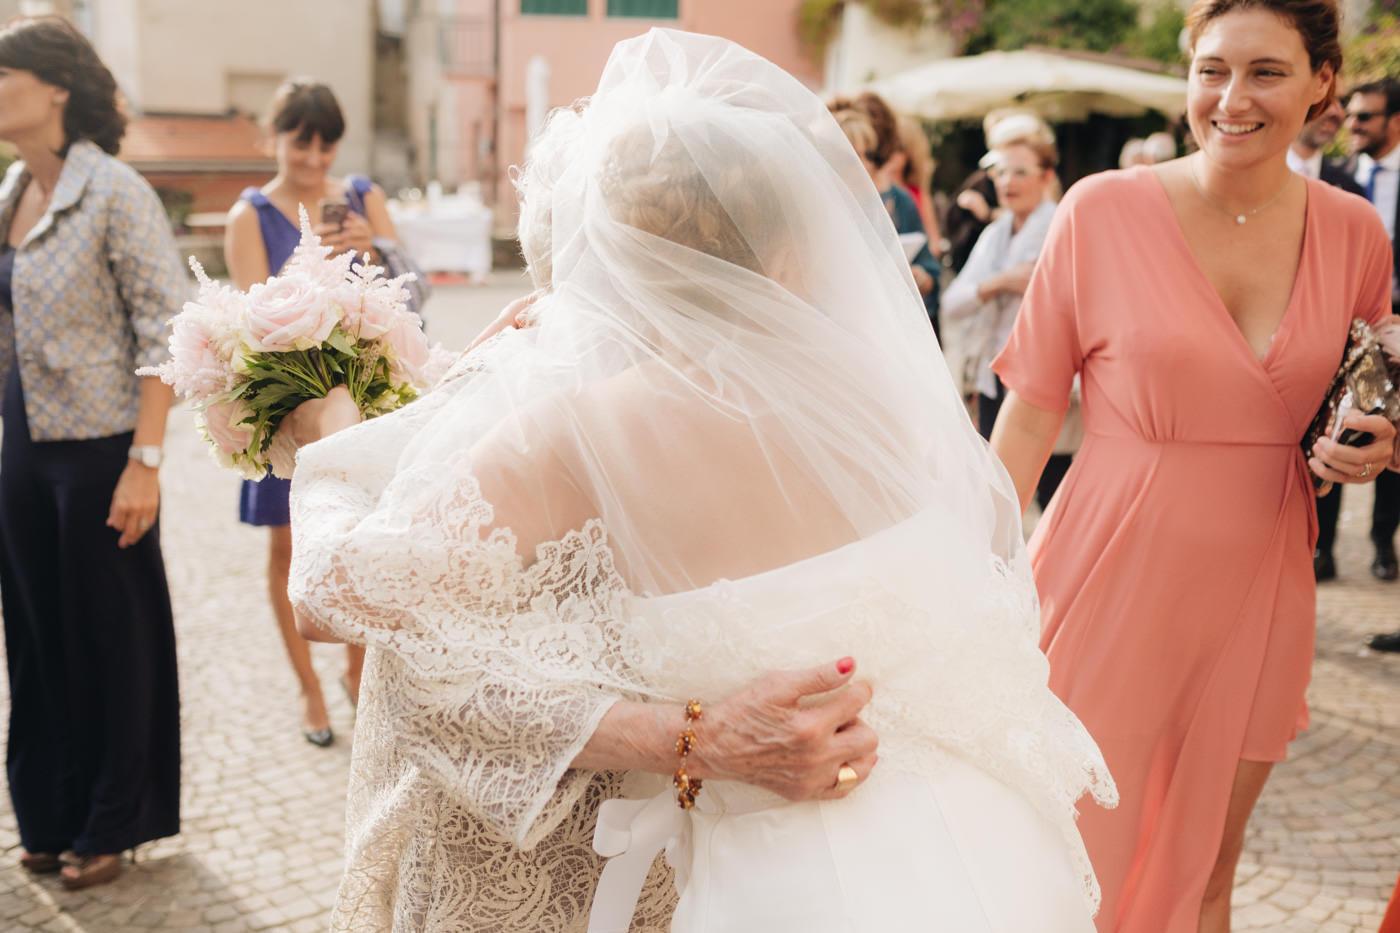 matrimoni_all_italiana_fotografo_matrimonio_cinque_terre-33.jpg